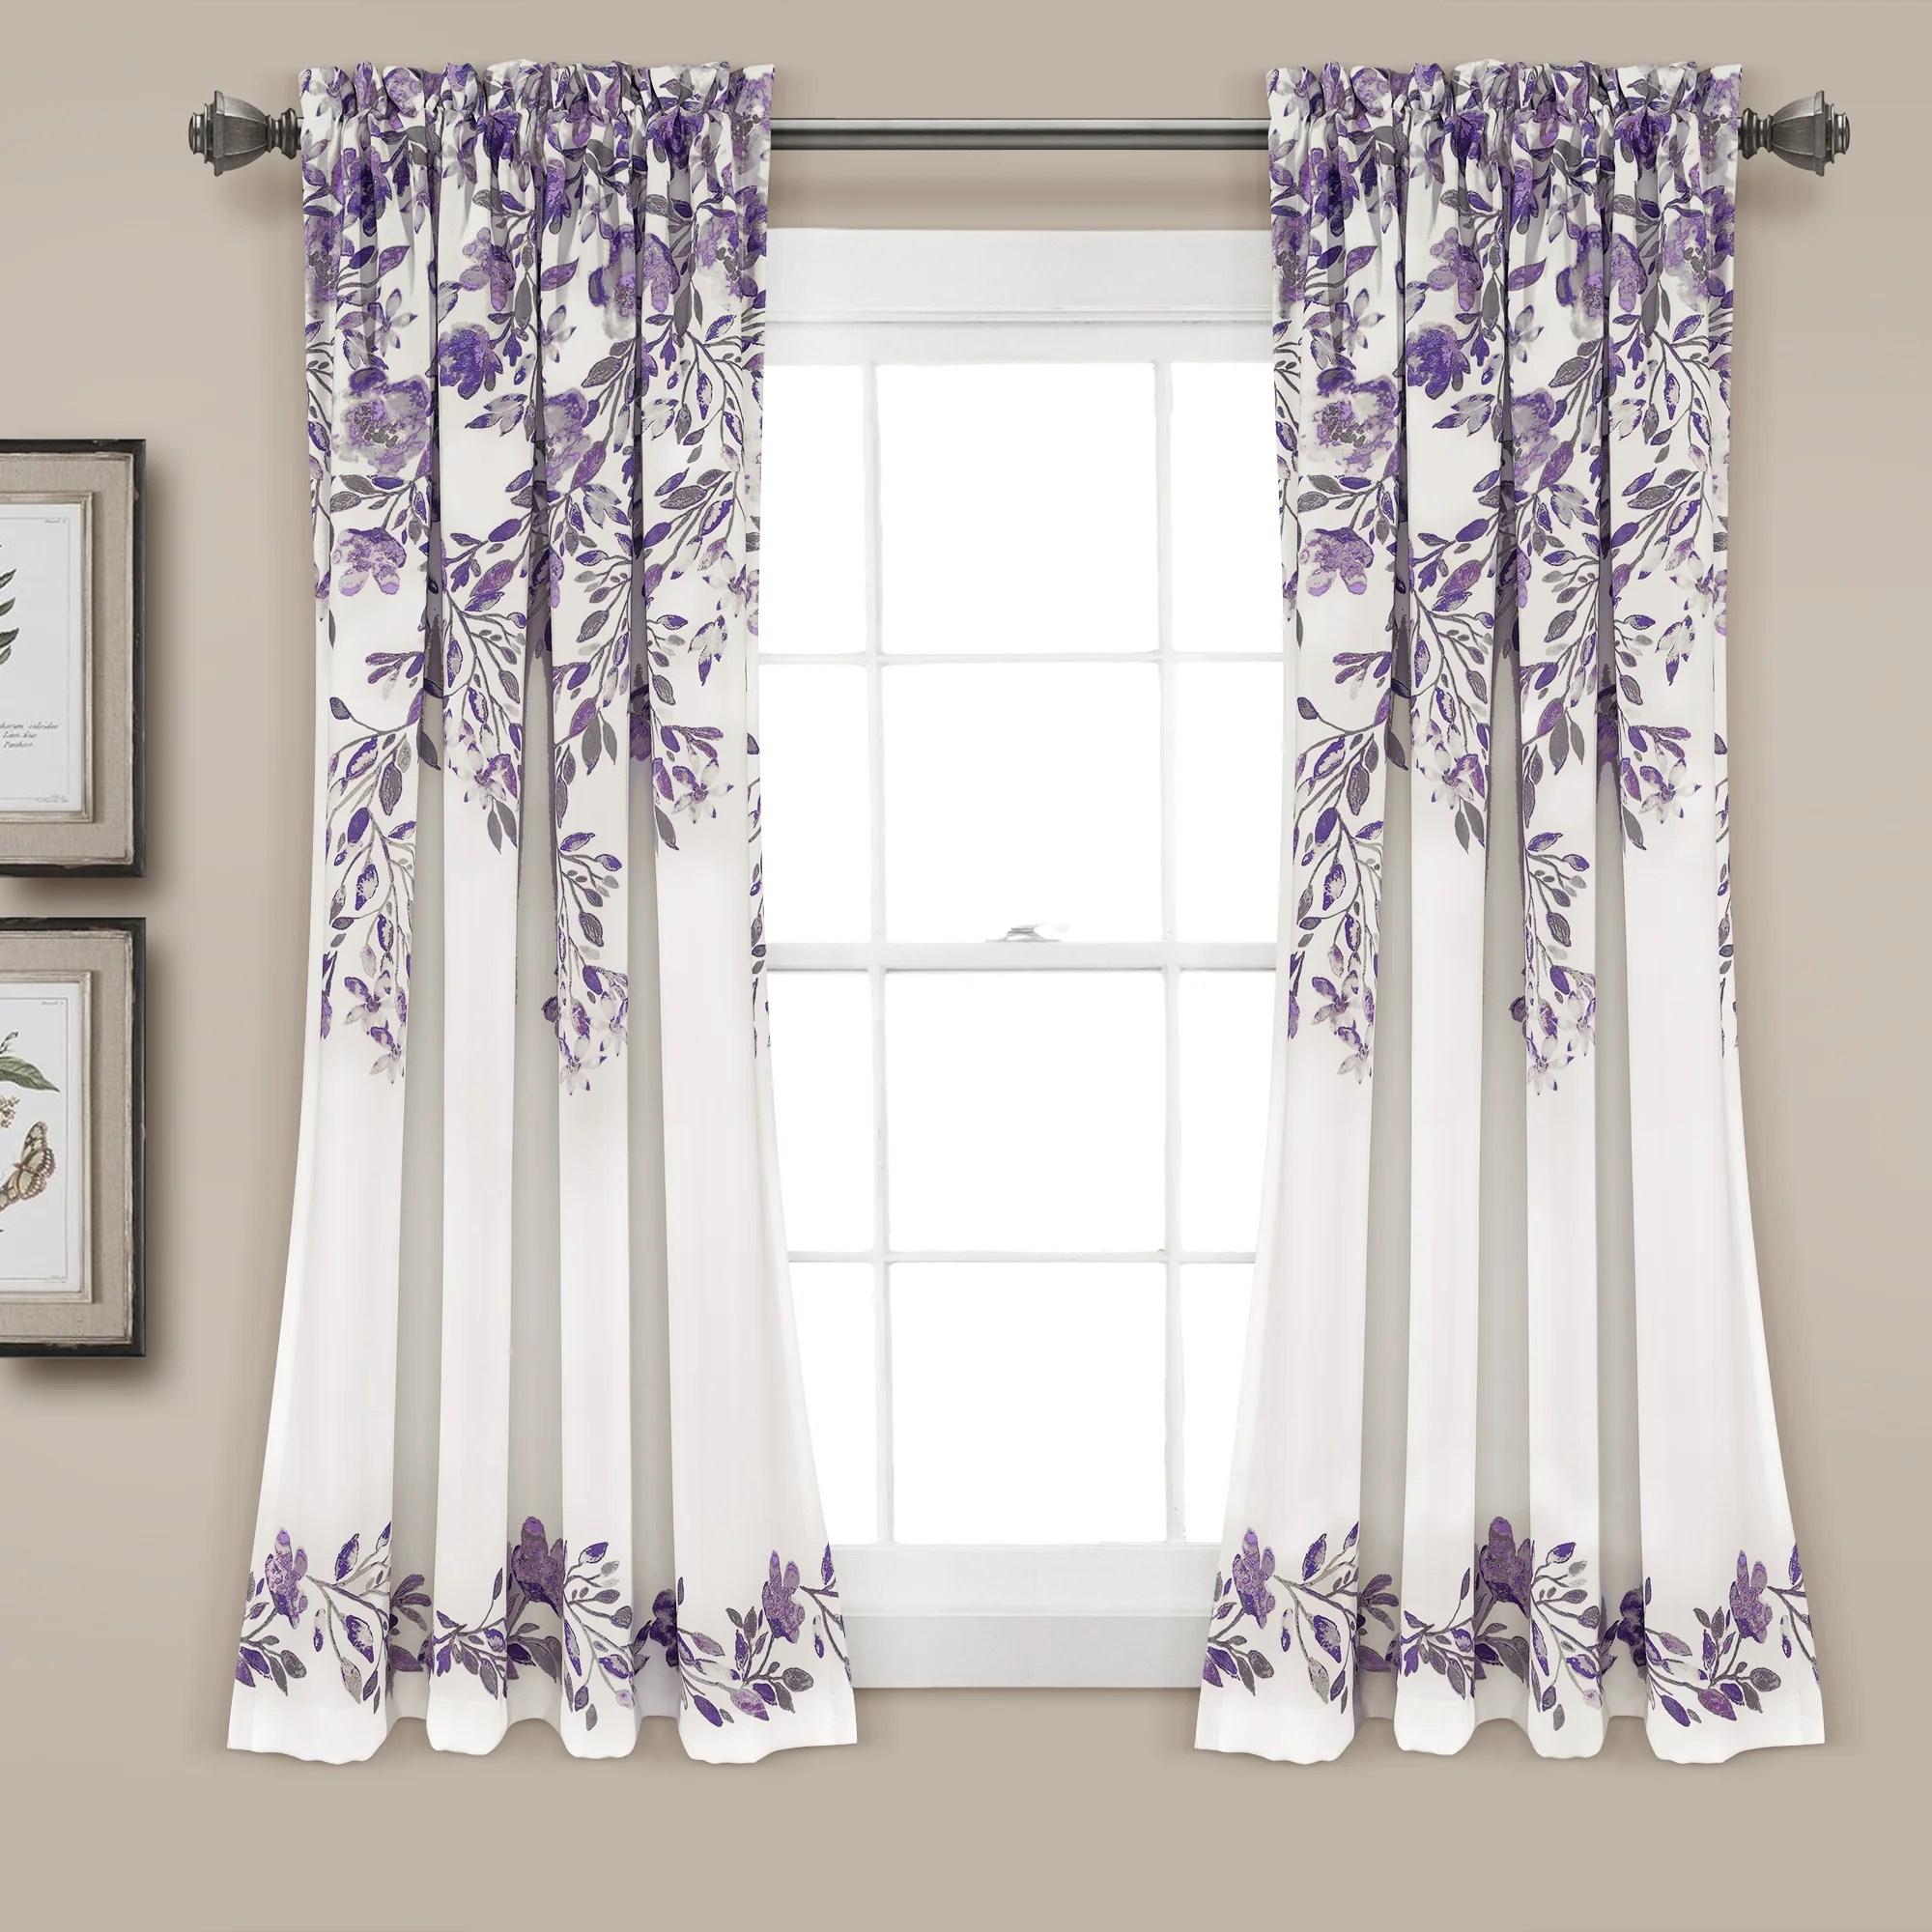 tanisha room darkening window curtain panel set 63 x 52 2 header purple gray